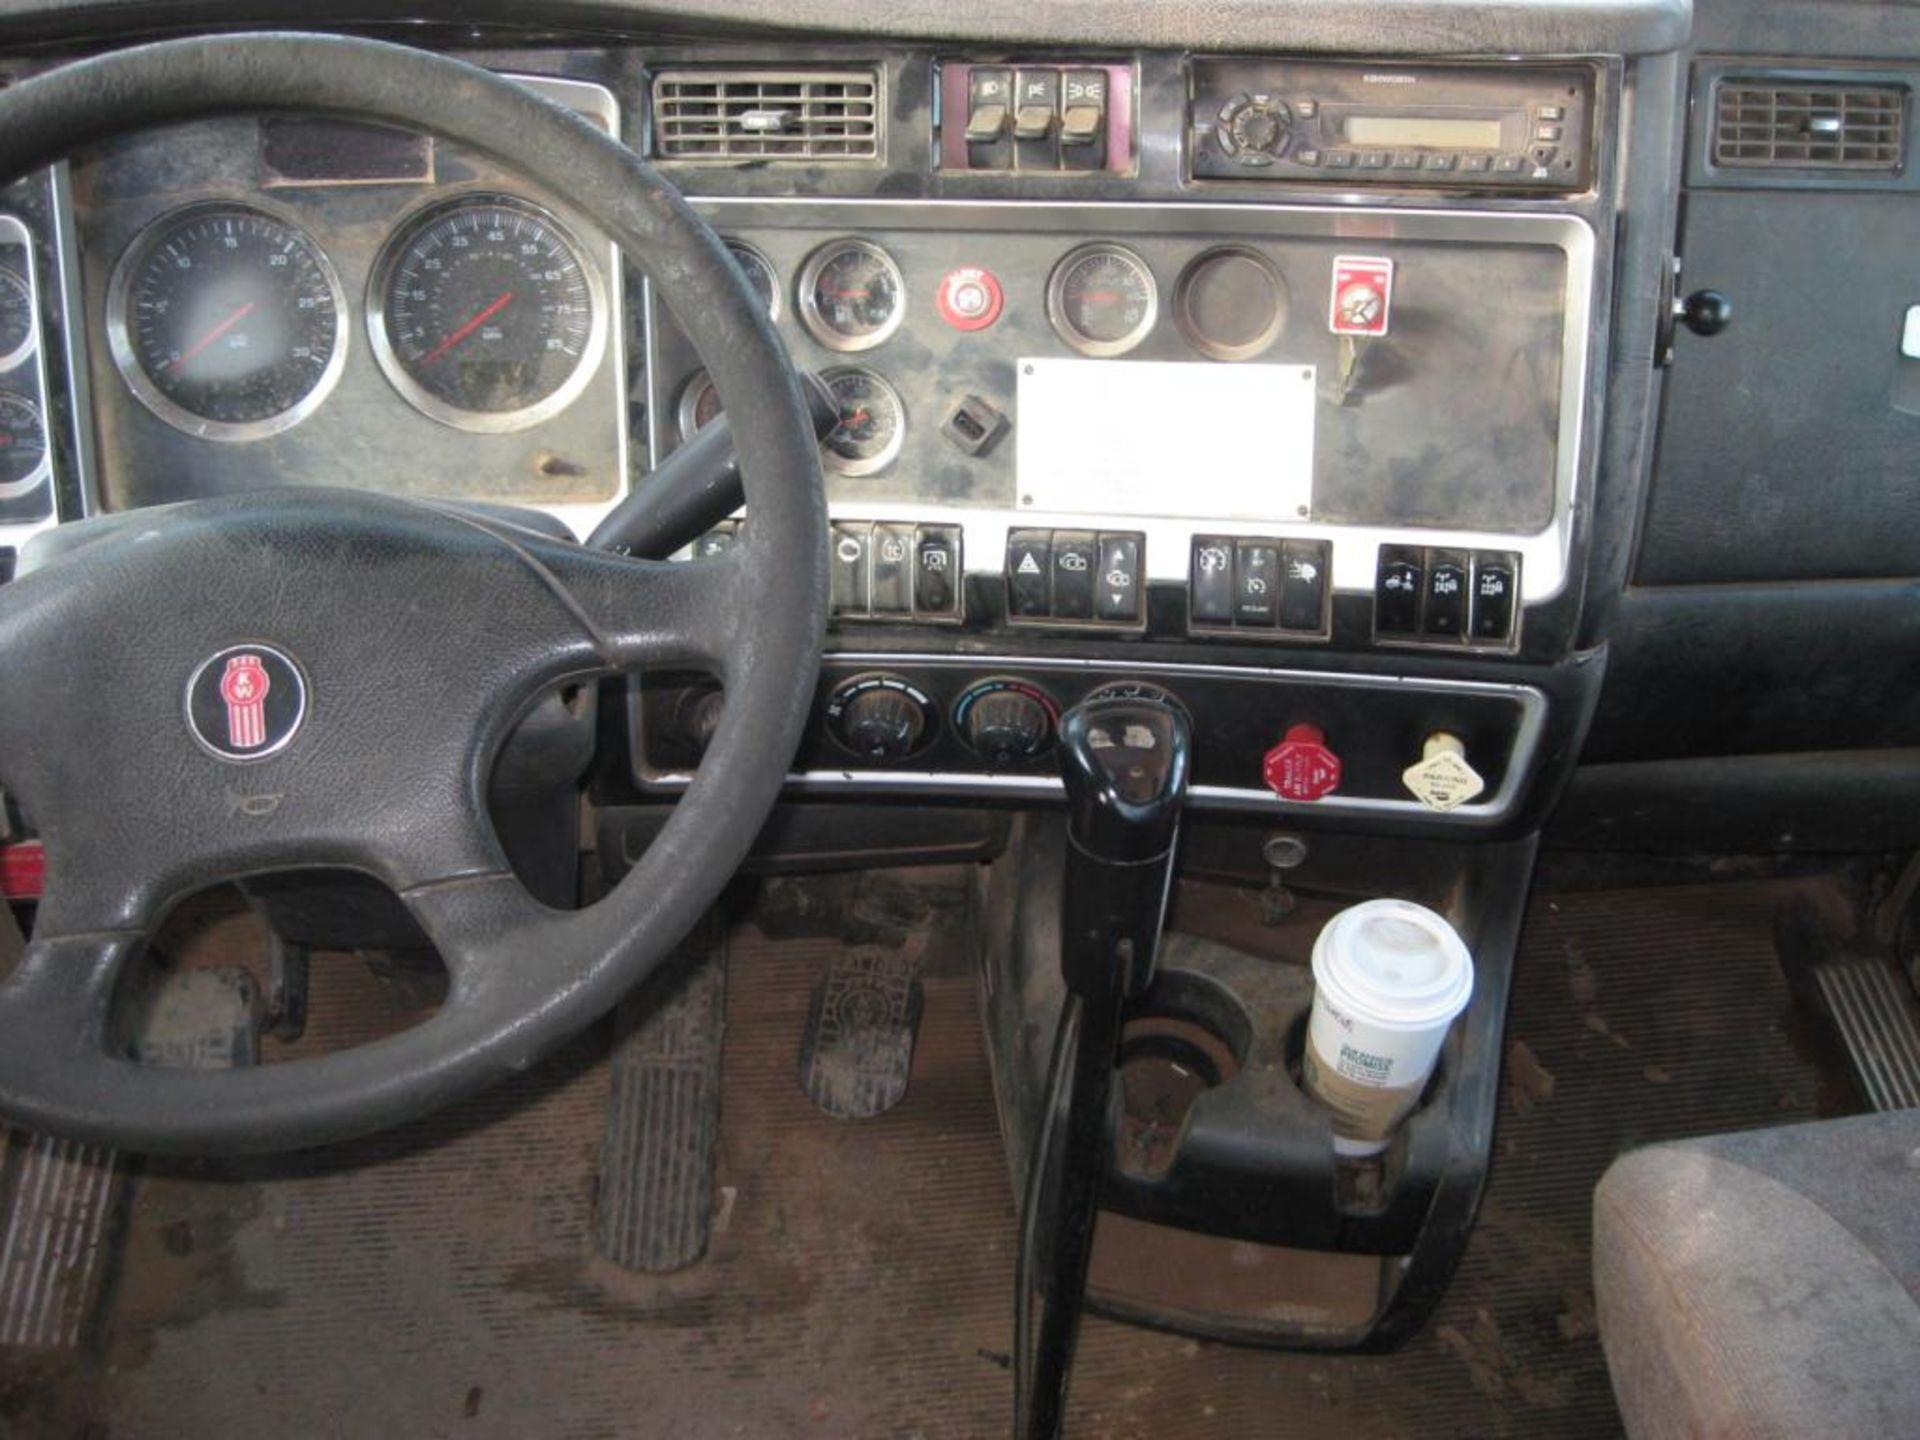 Kenworth Winch Truck - Image 16 of 22